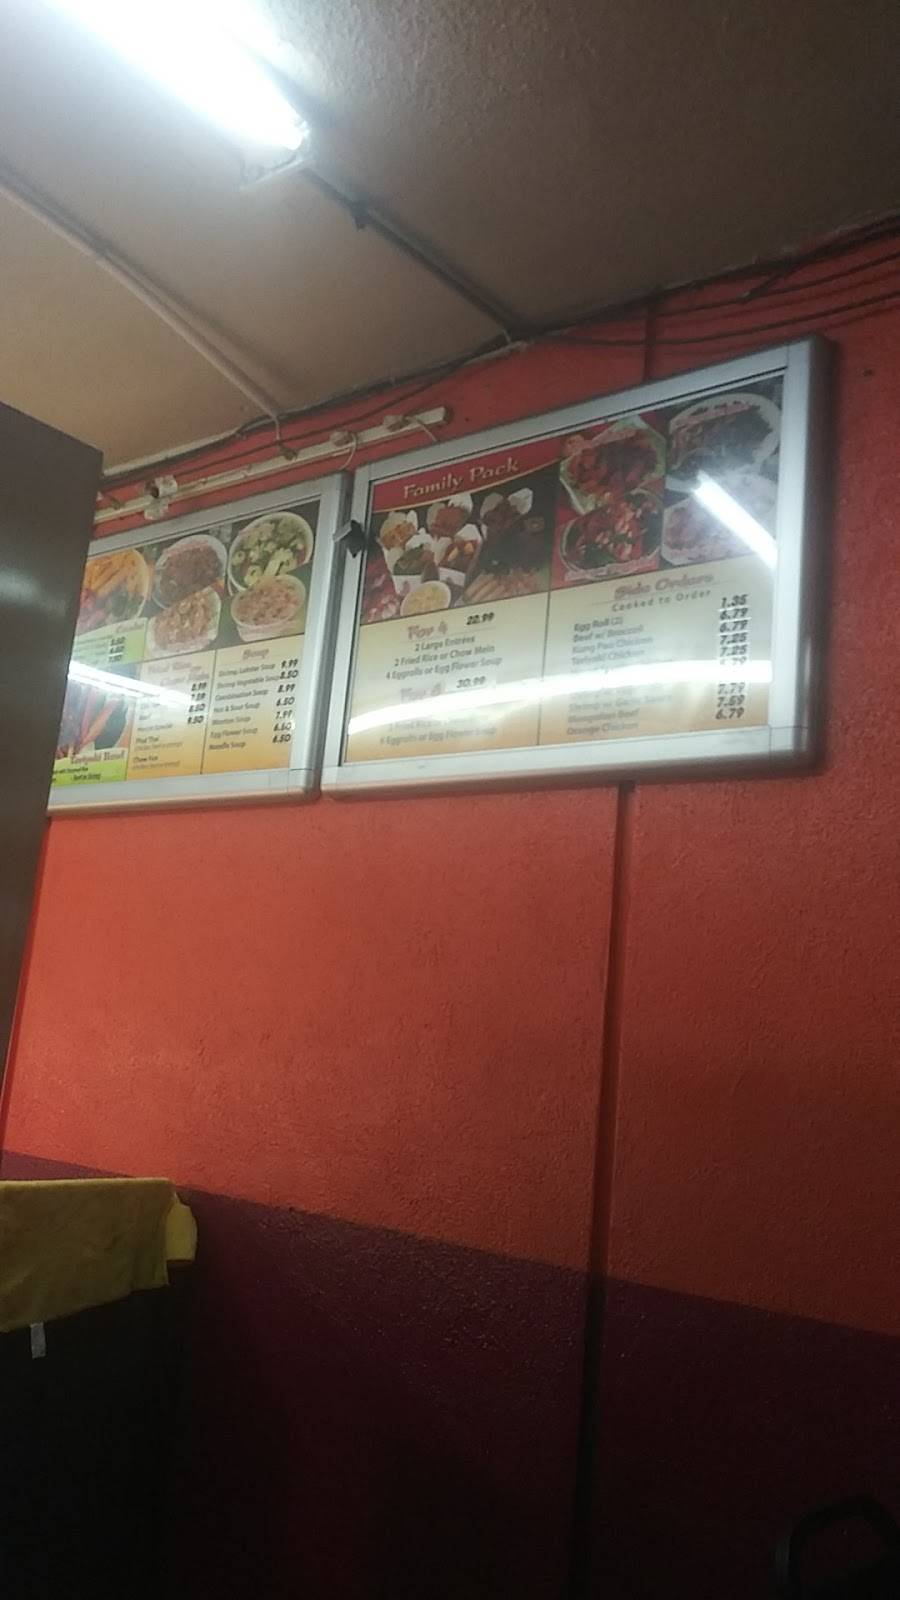 Louisiana Fried Chicken   restaurant   6090 Long Beach Boulevard, Long Beach, CA 90805, USA   5624234788 OR +1 562-423-4788